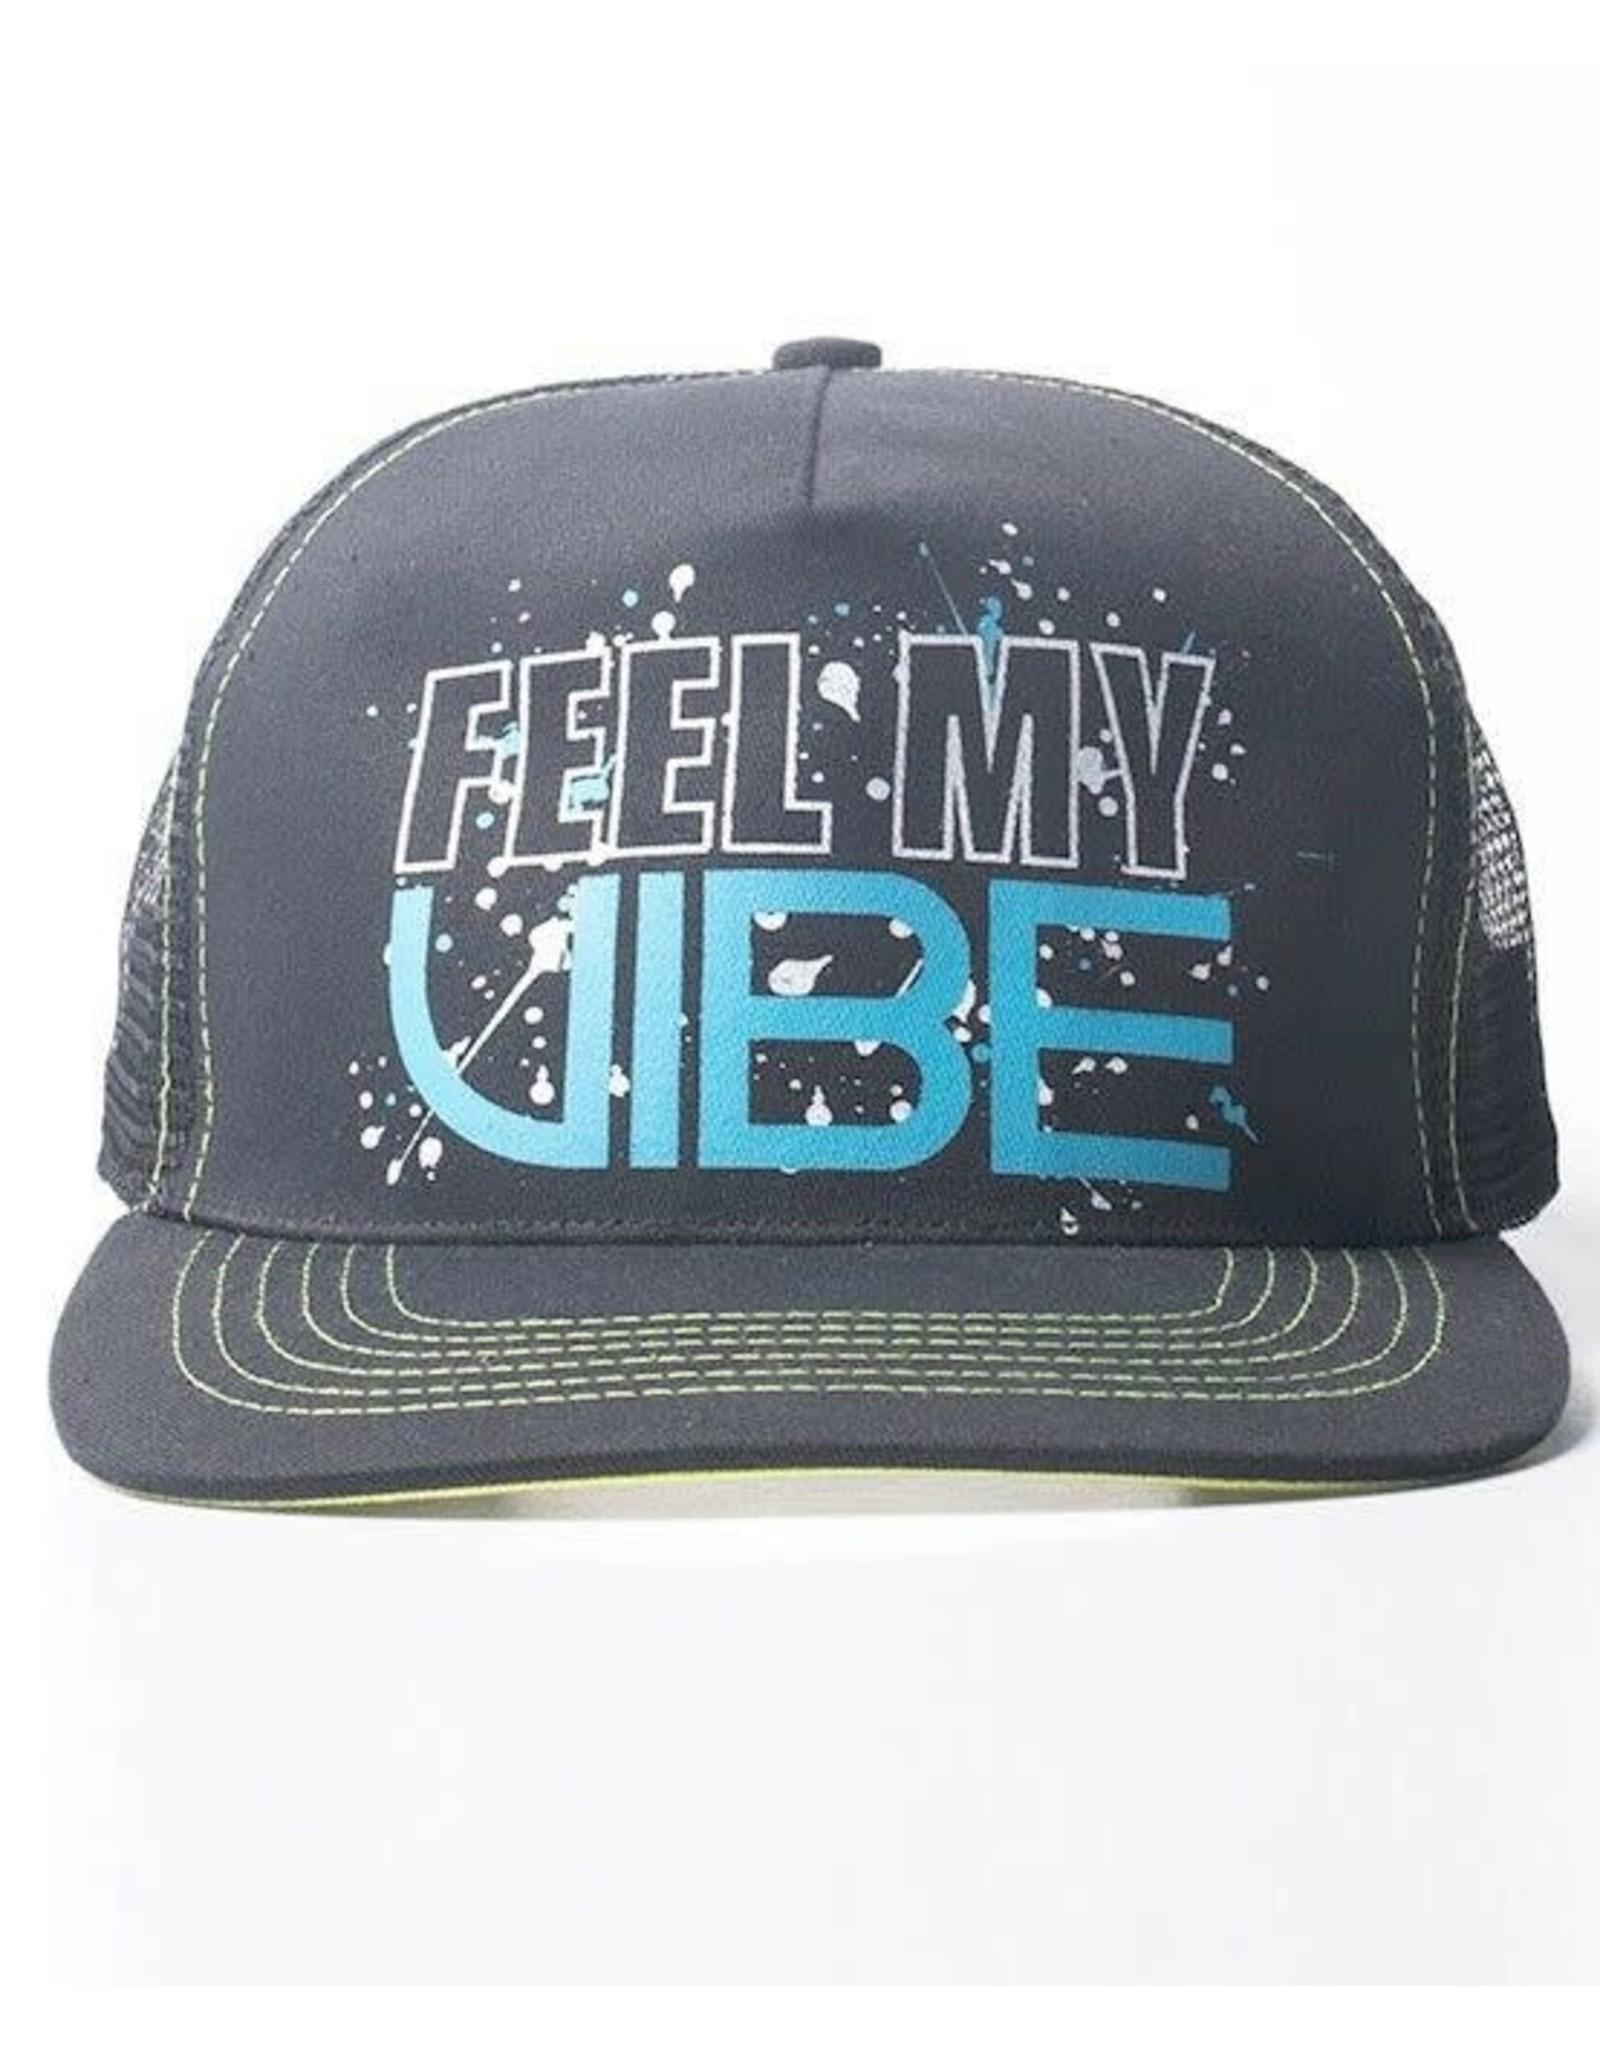 ANDREW CHRISTIAN-FEEL MY VIBE CAP BLACK/ONE SIZE